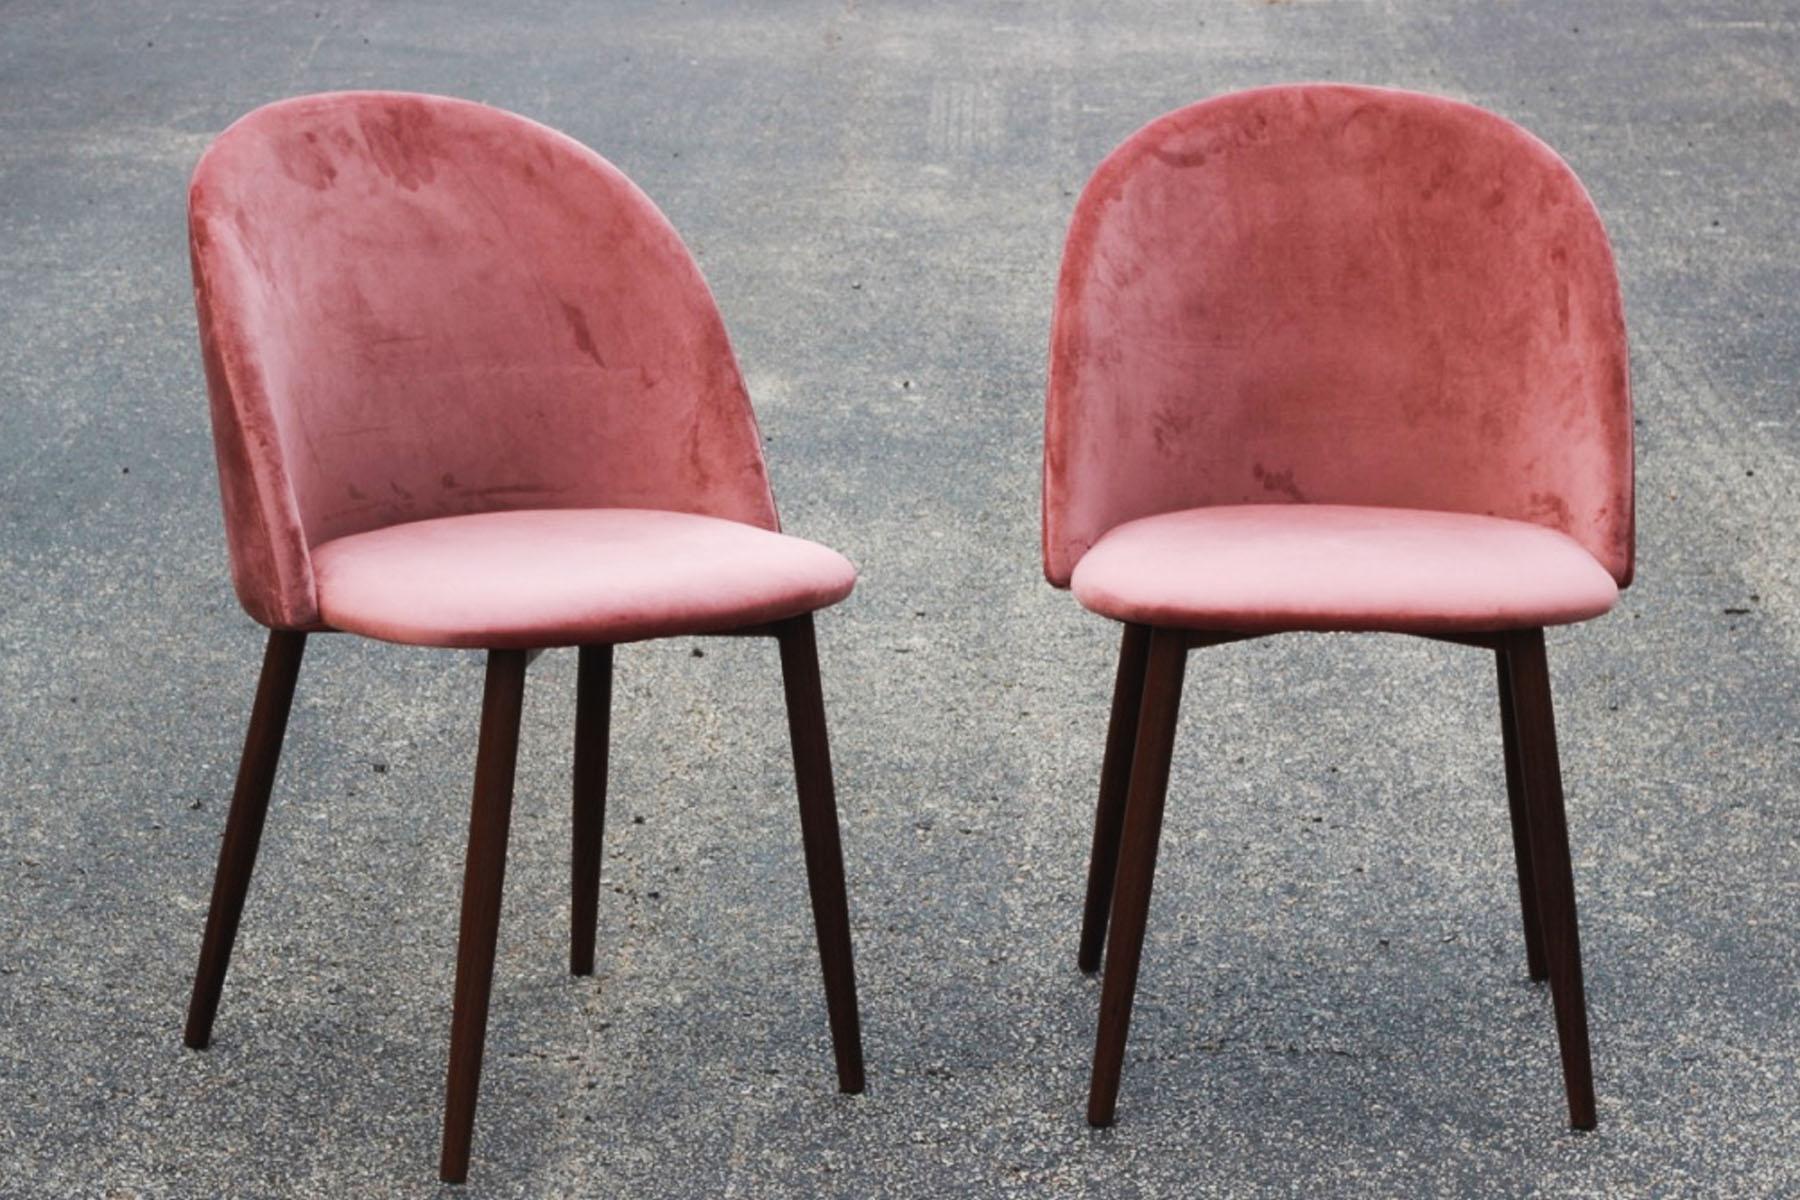 Nala Chairs - Tulsa Wedding Rentals